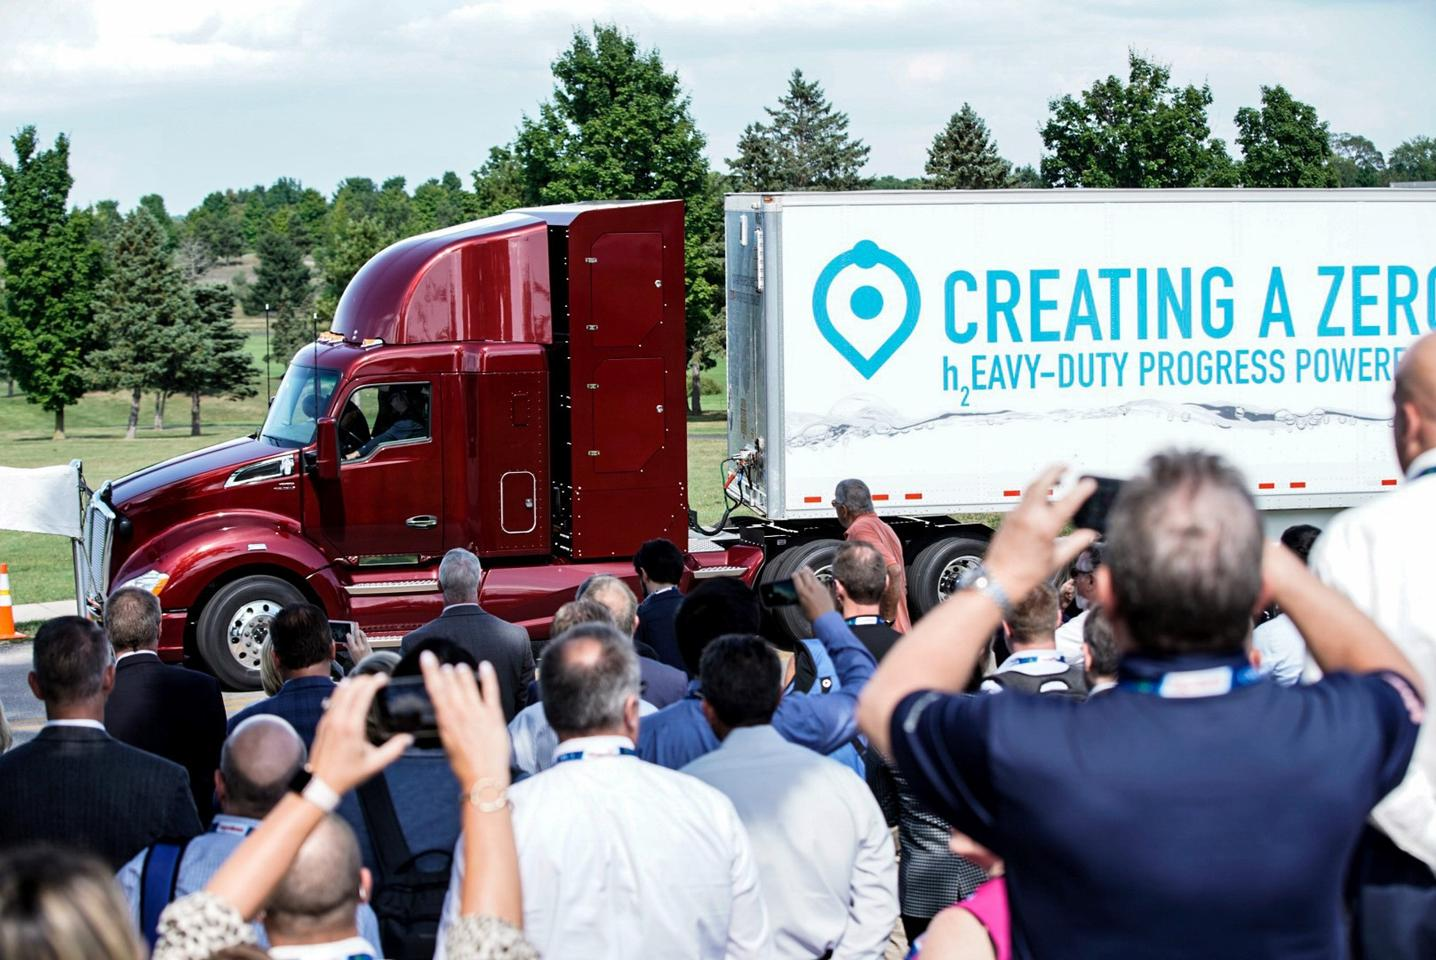 The Beta, or Project Portal 2.0, truck has a similar drivetrain to the original